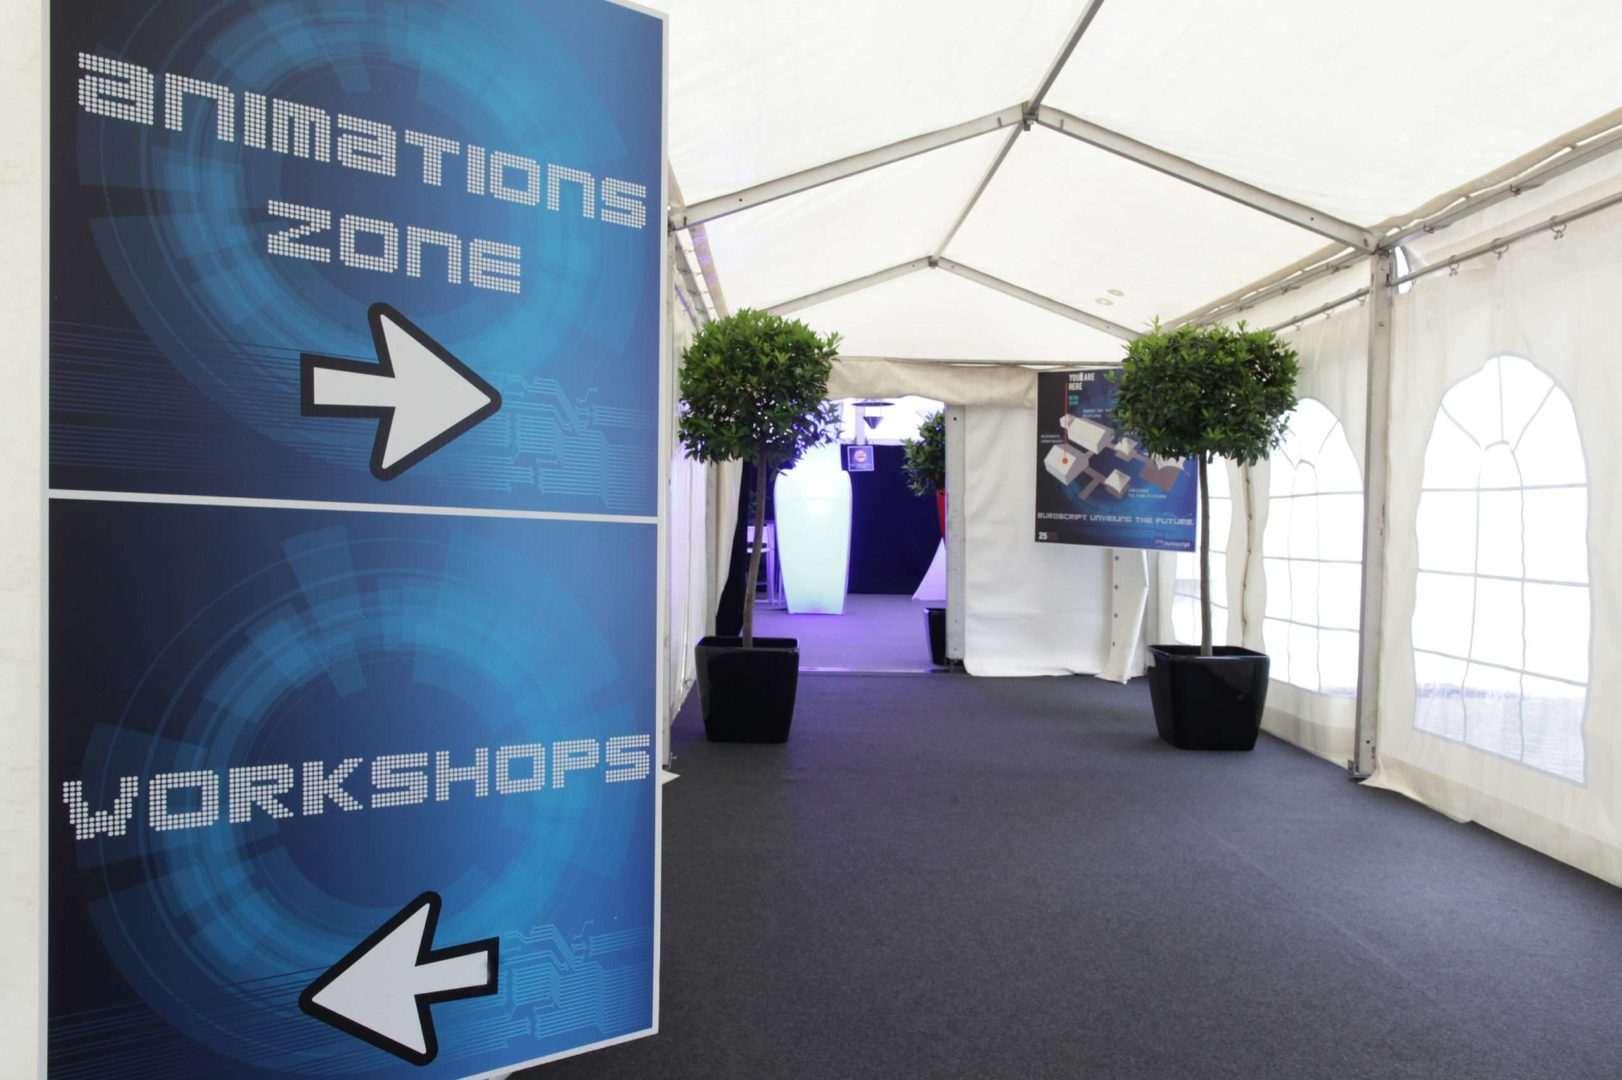 25-ans-euroscript-2009-animation-zone-rencontre-échange-luxembourg